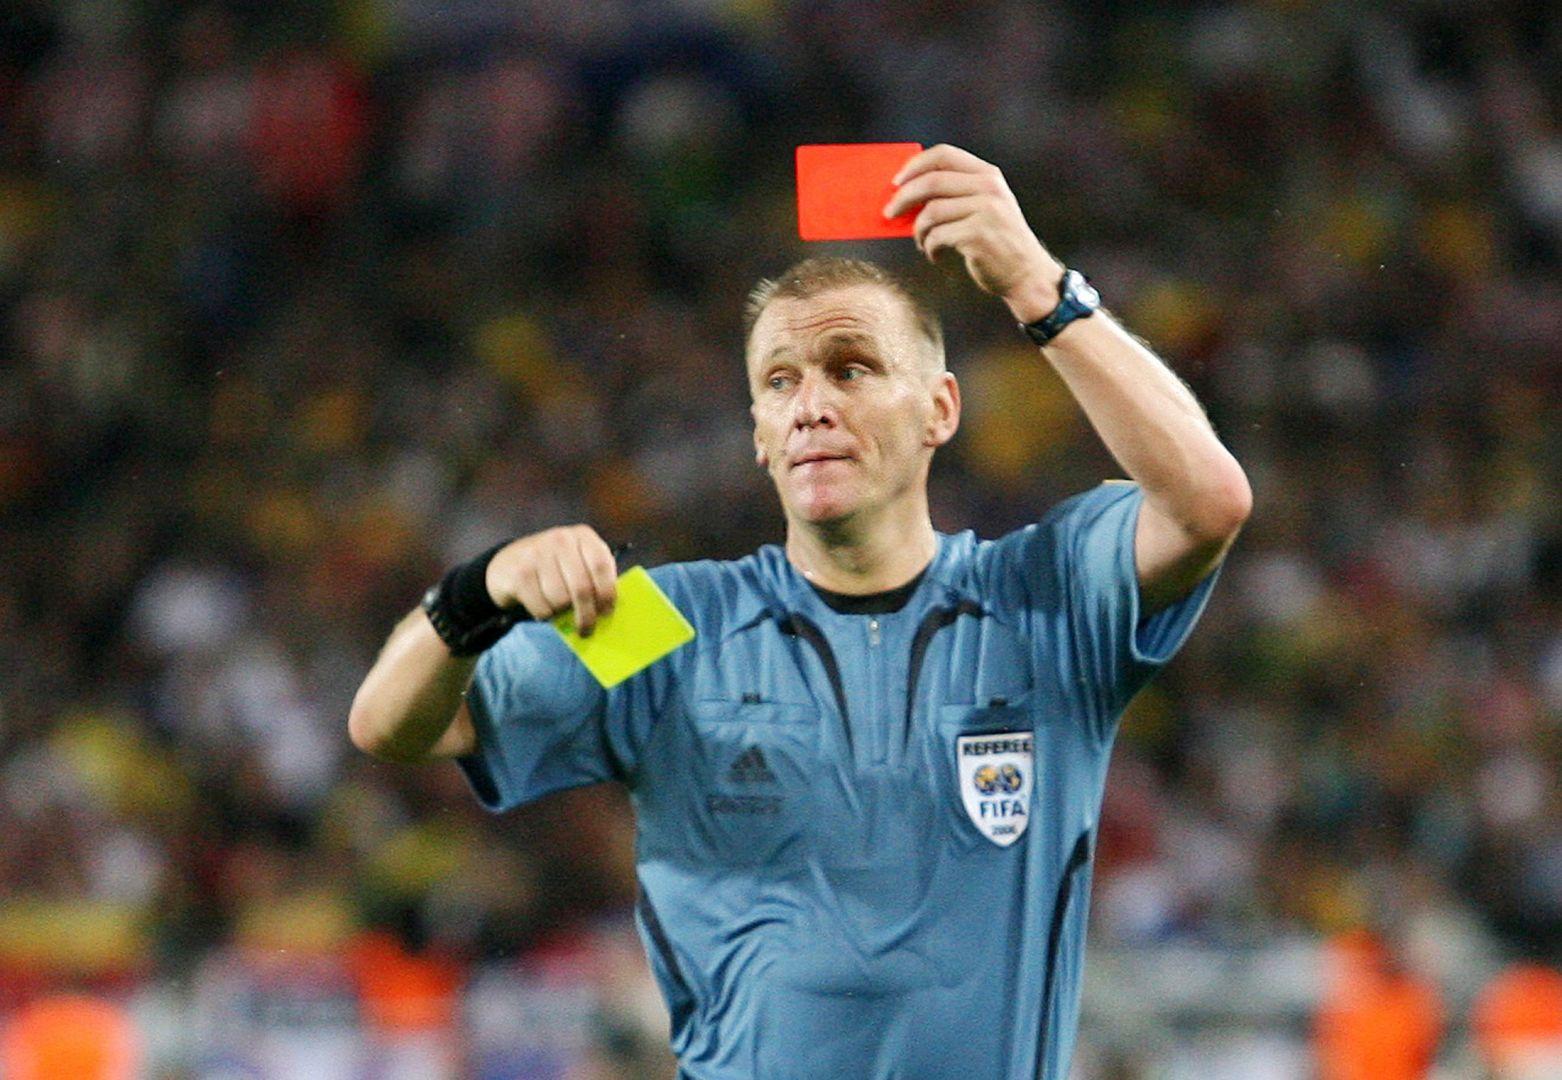 Liga Sepak Bola Inggris Dan FA Membuat Peraturan Baru